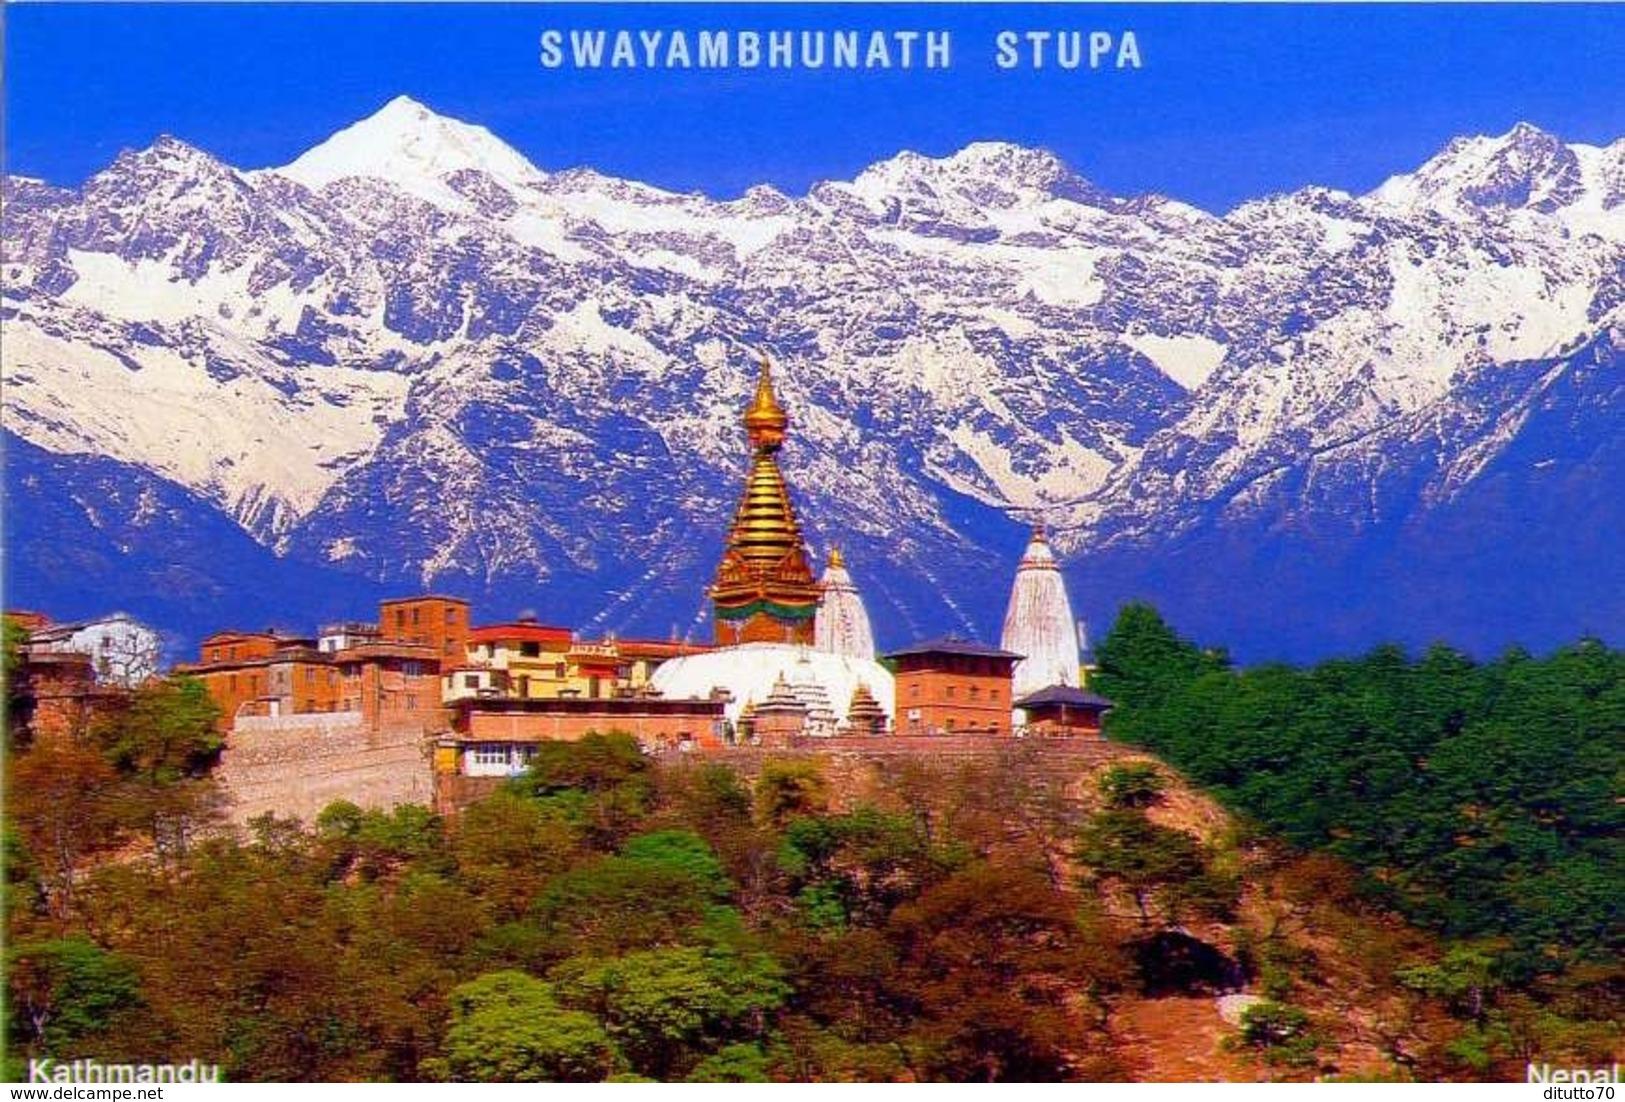 Nepal - Swayambhunath Stupa - Kathmandun - Formato Grande Viaggiata - E - Nepal